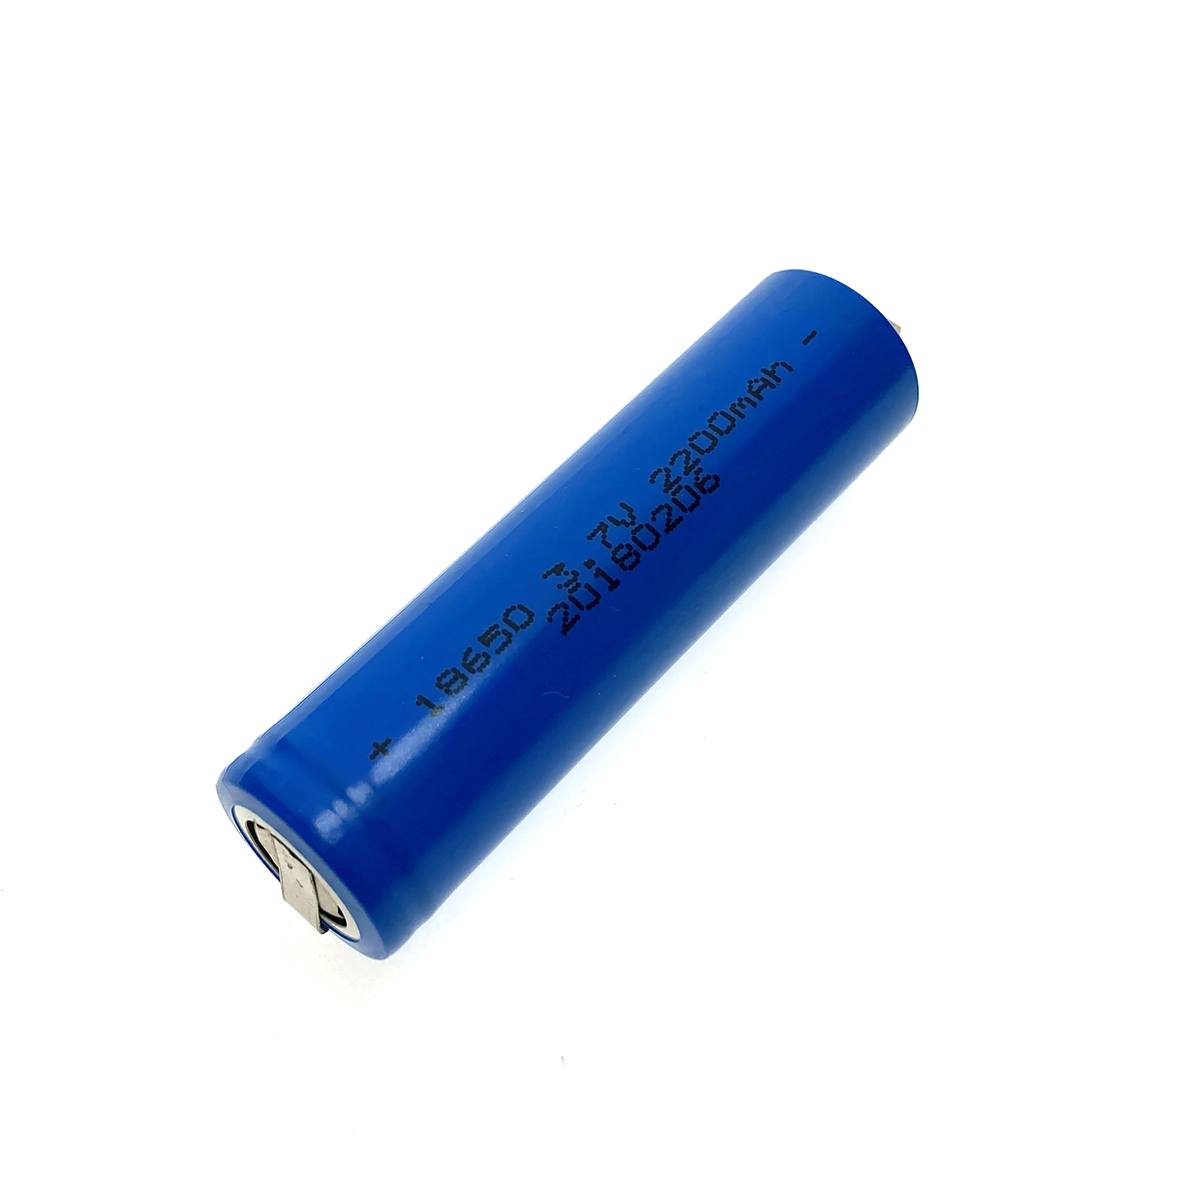 Аккумулятор Li-Ion 18650, Espada 18650C4-2200mAh, 3.7V, nickel tags, с выводами